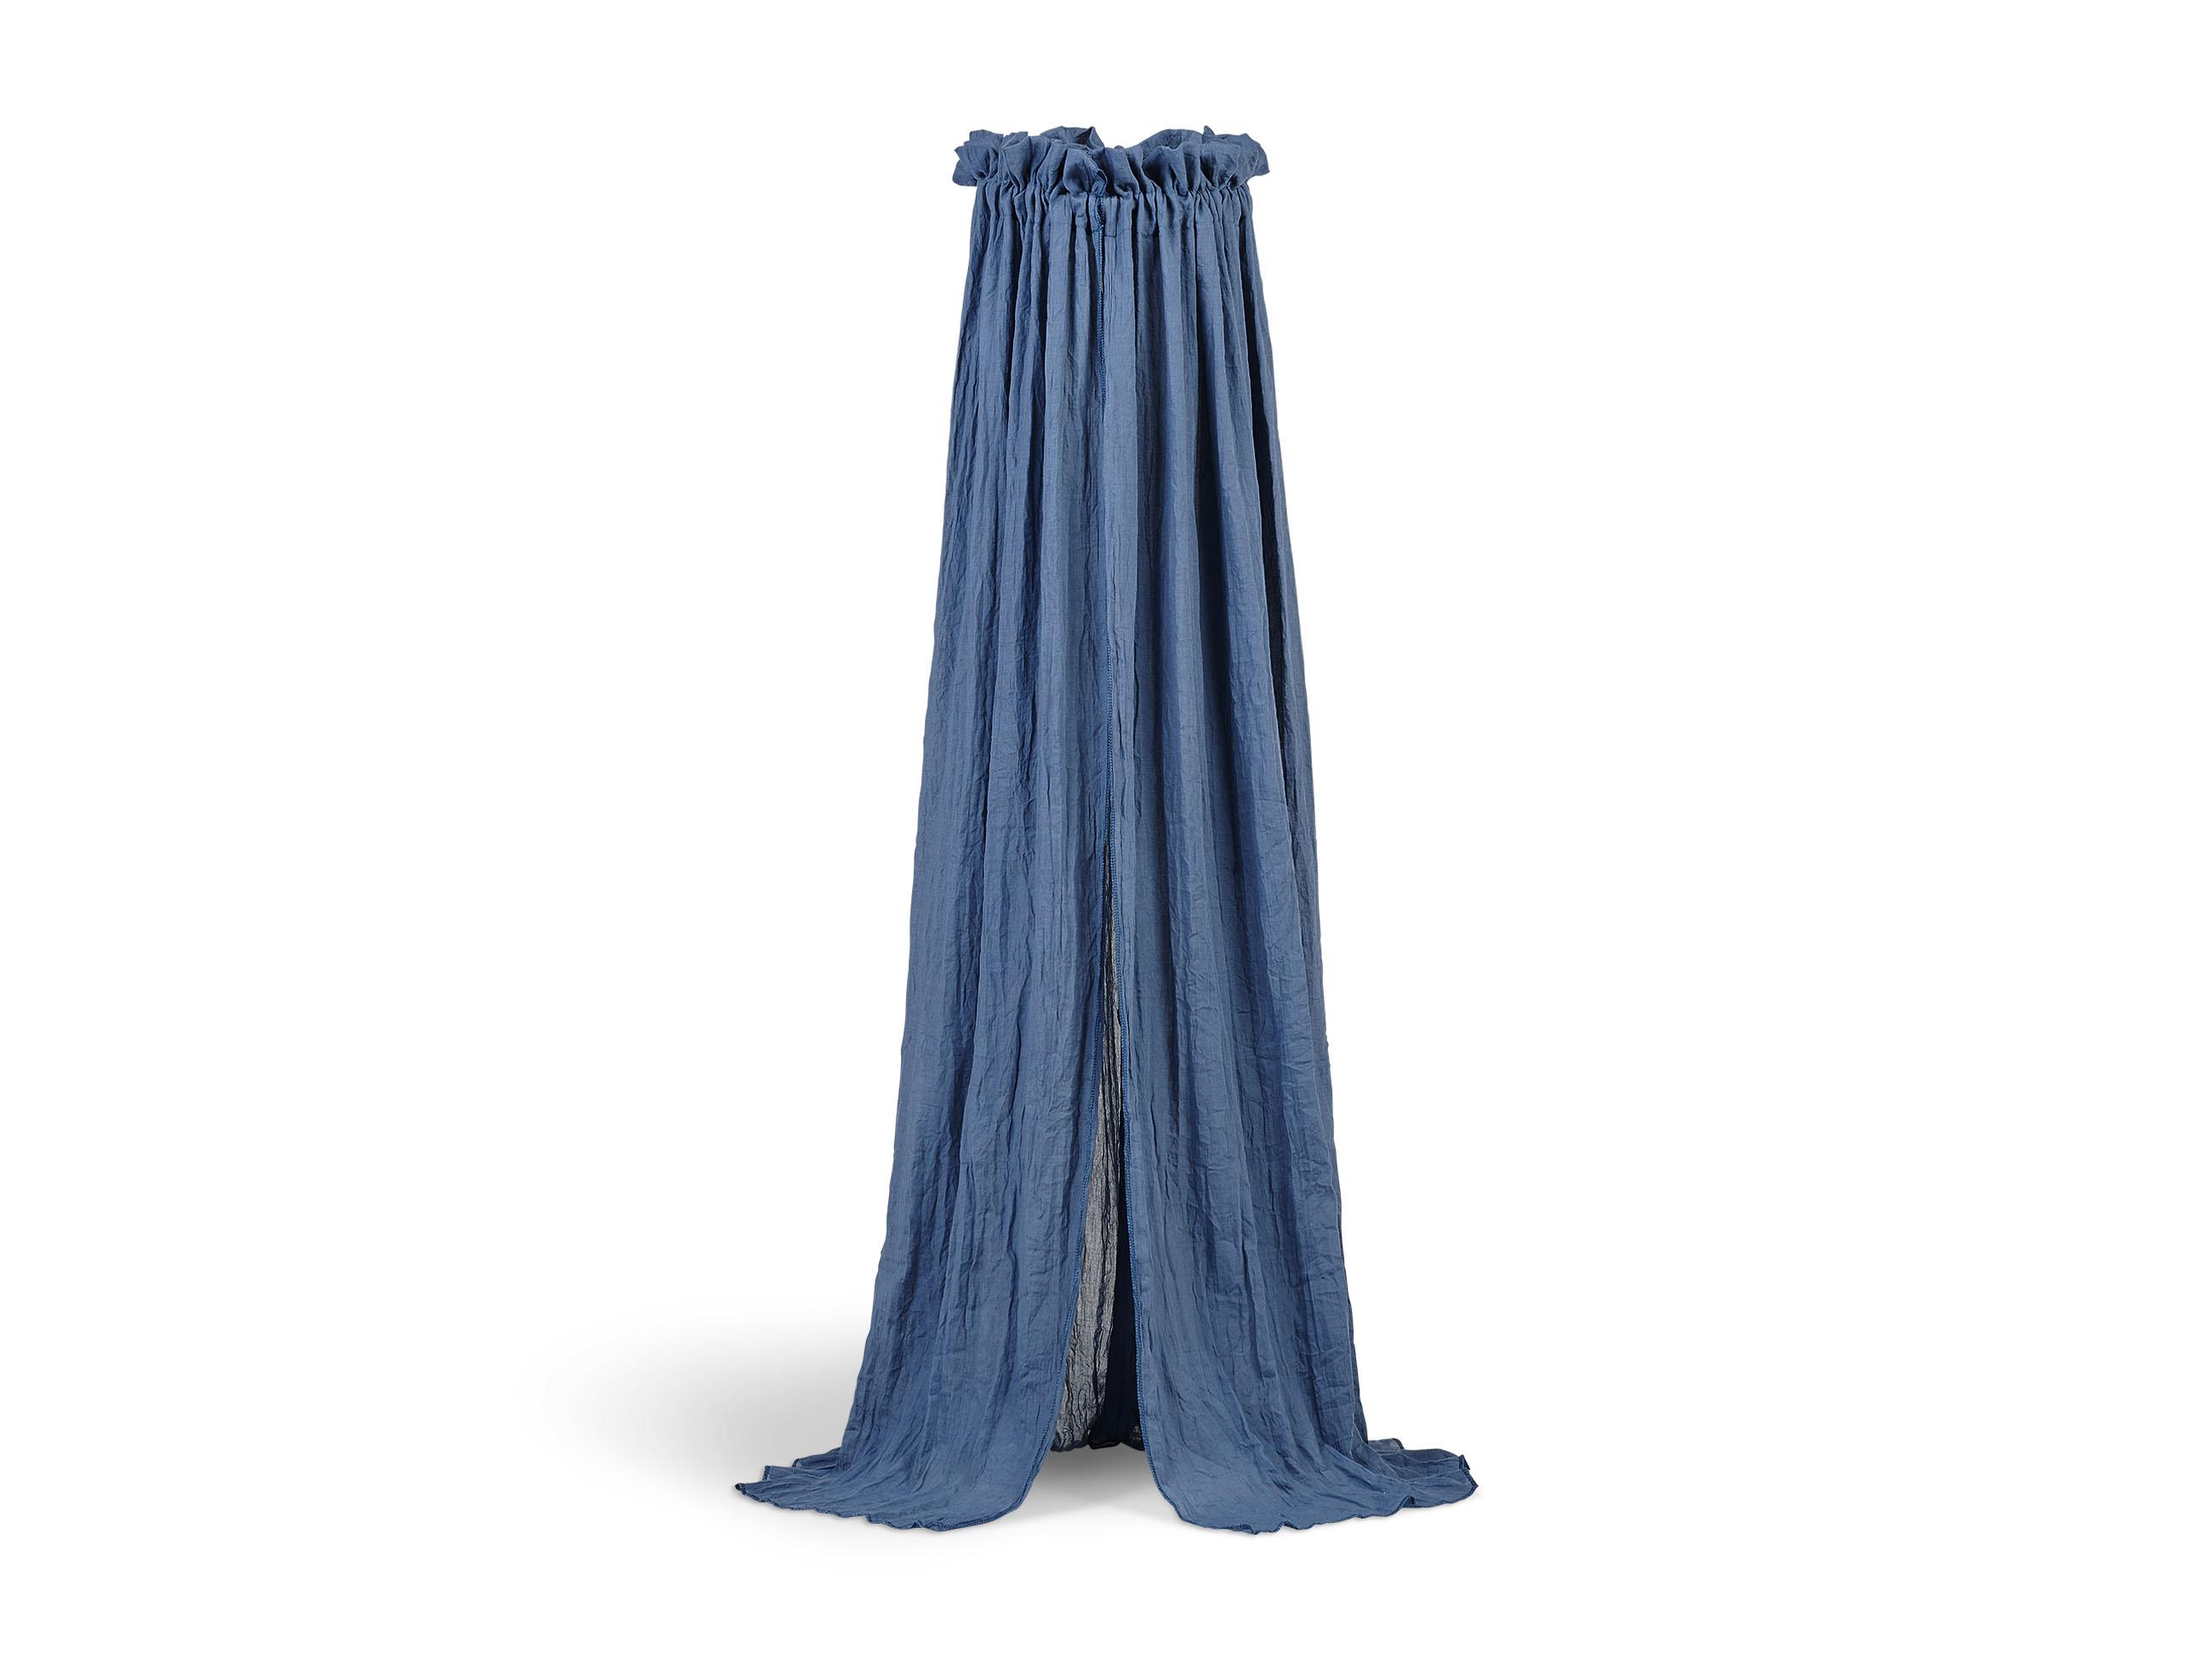 Betthimmel Vintage blau (155 cm)